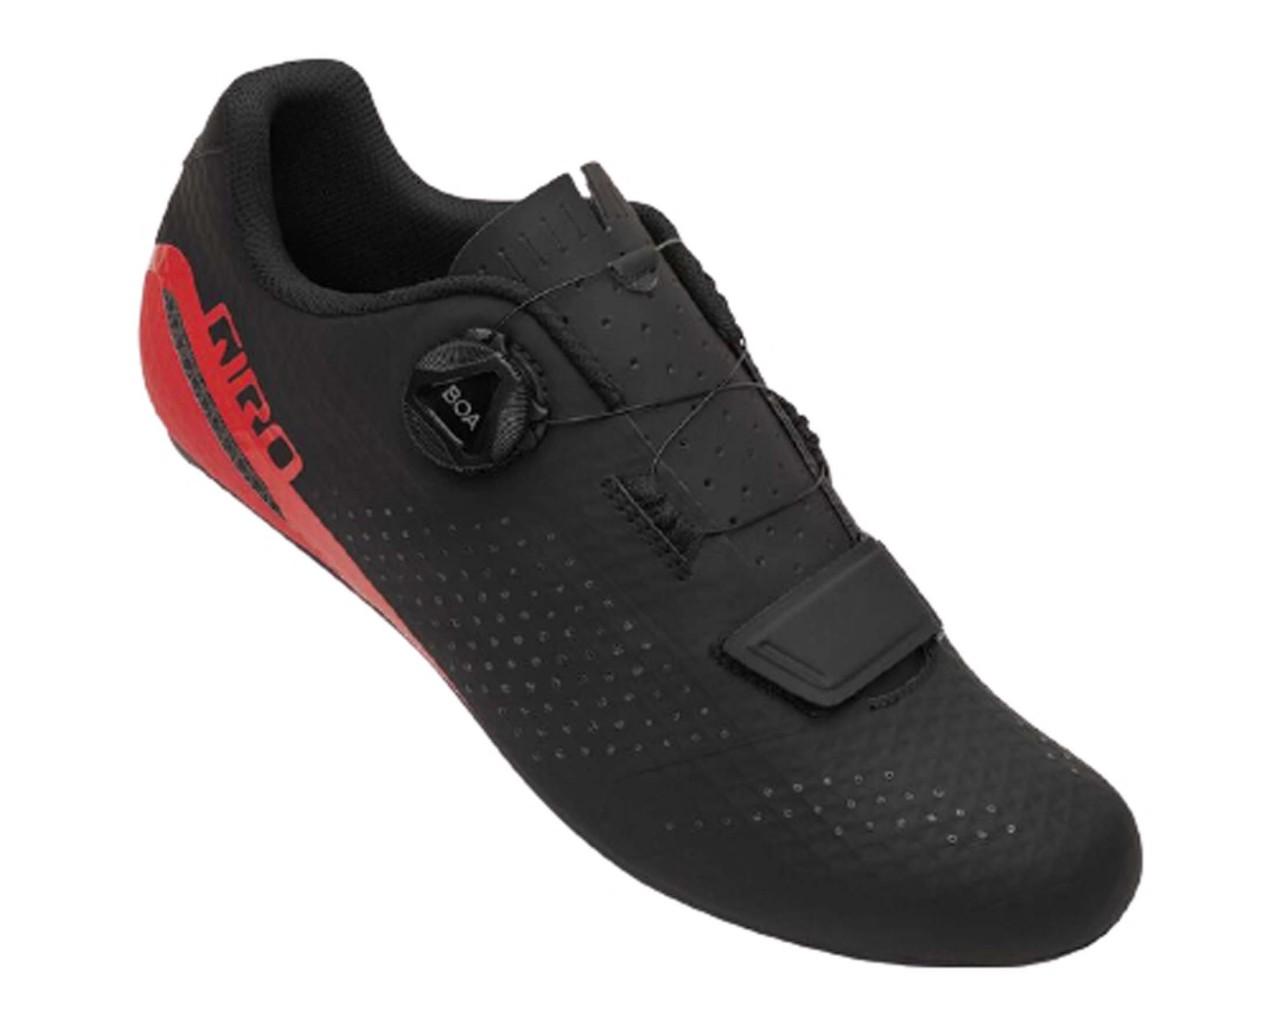 Giro Cadet - Road Shoes | black-bright red